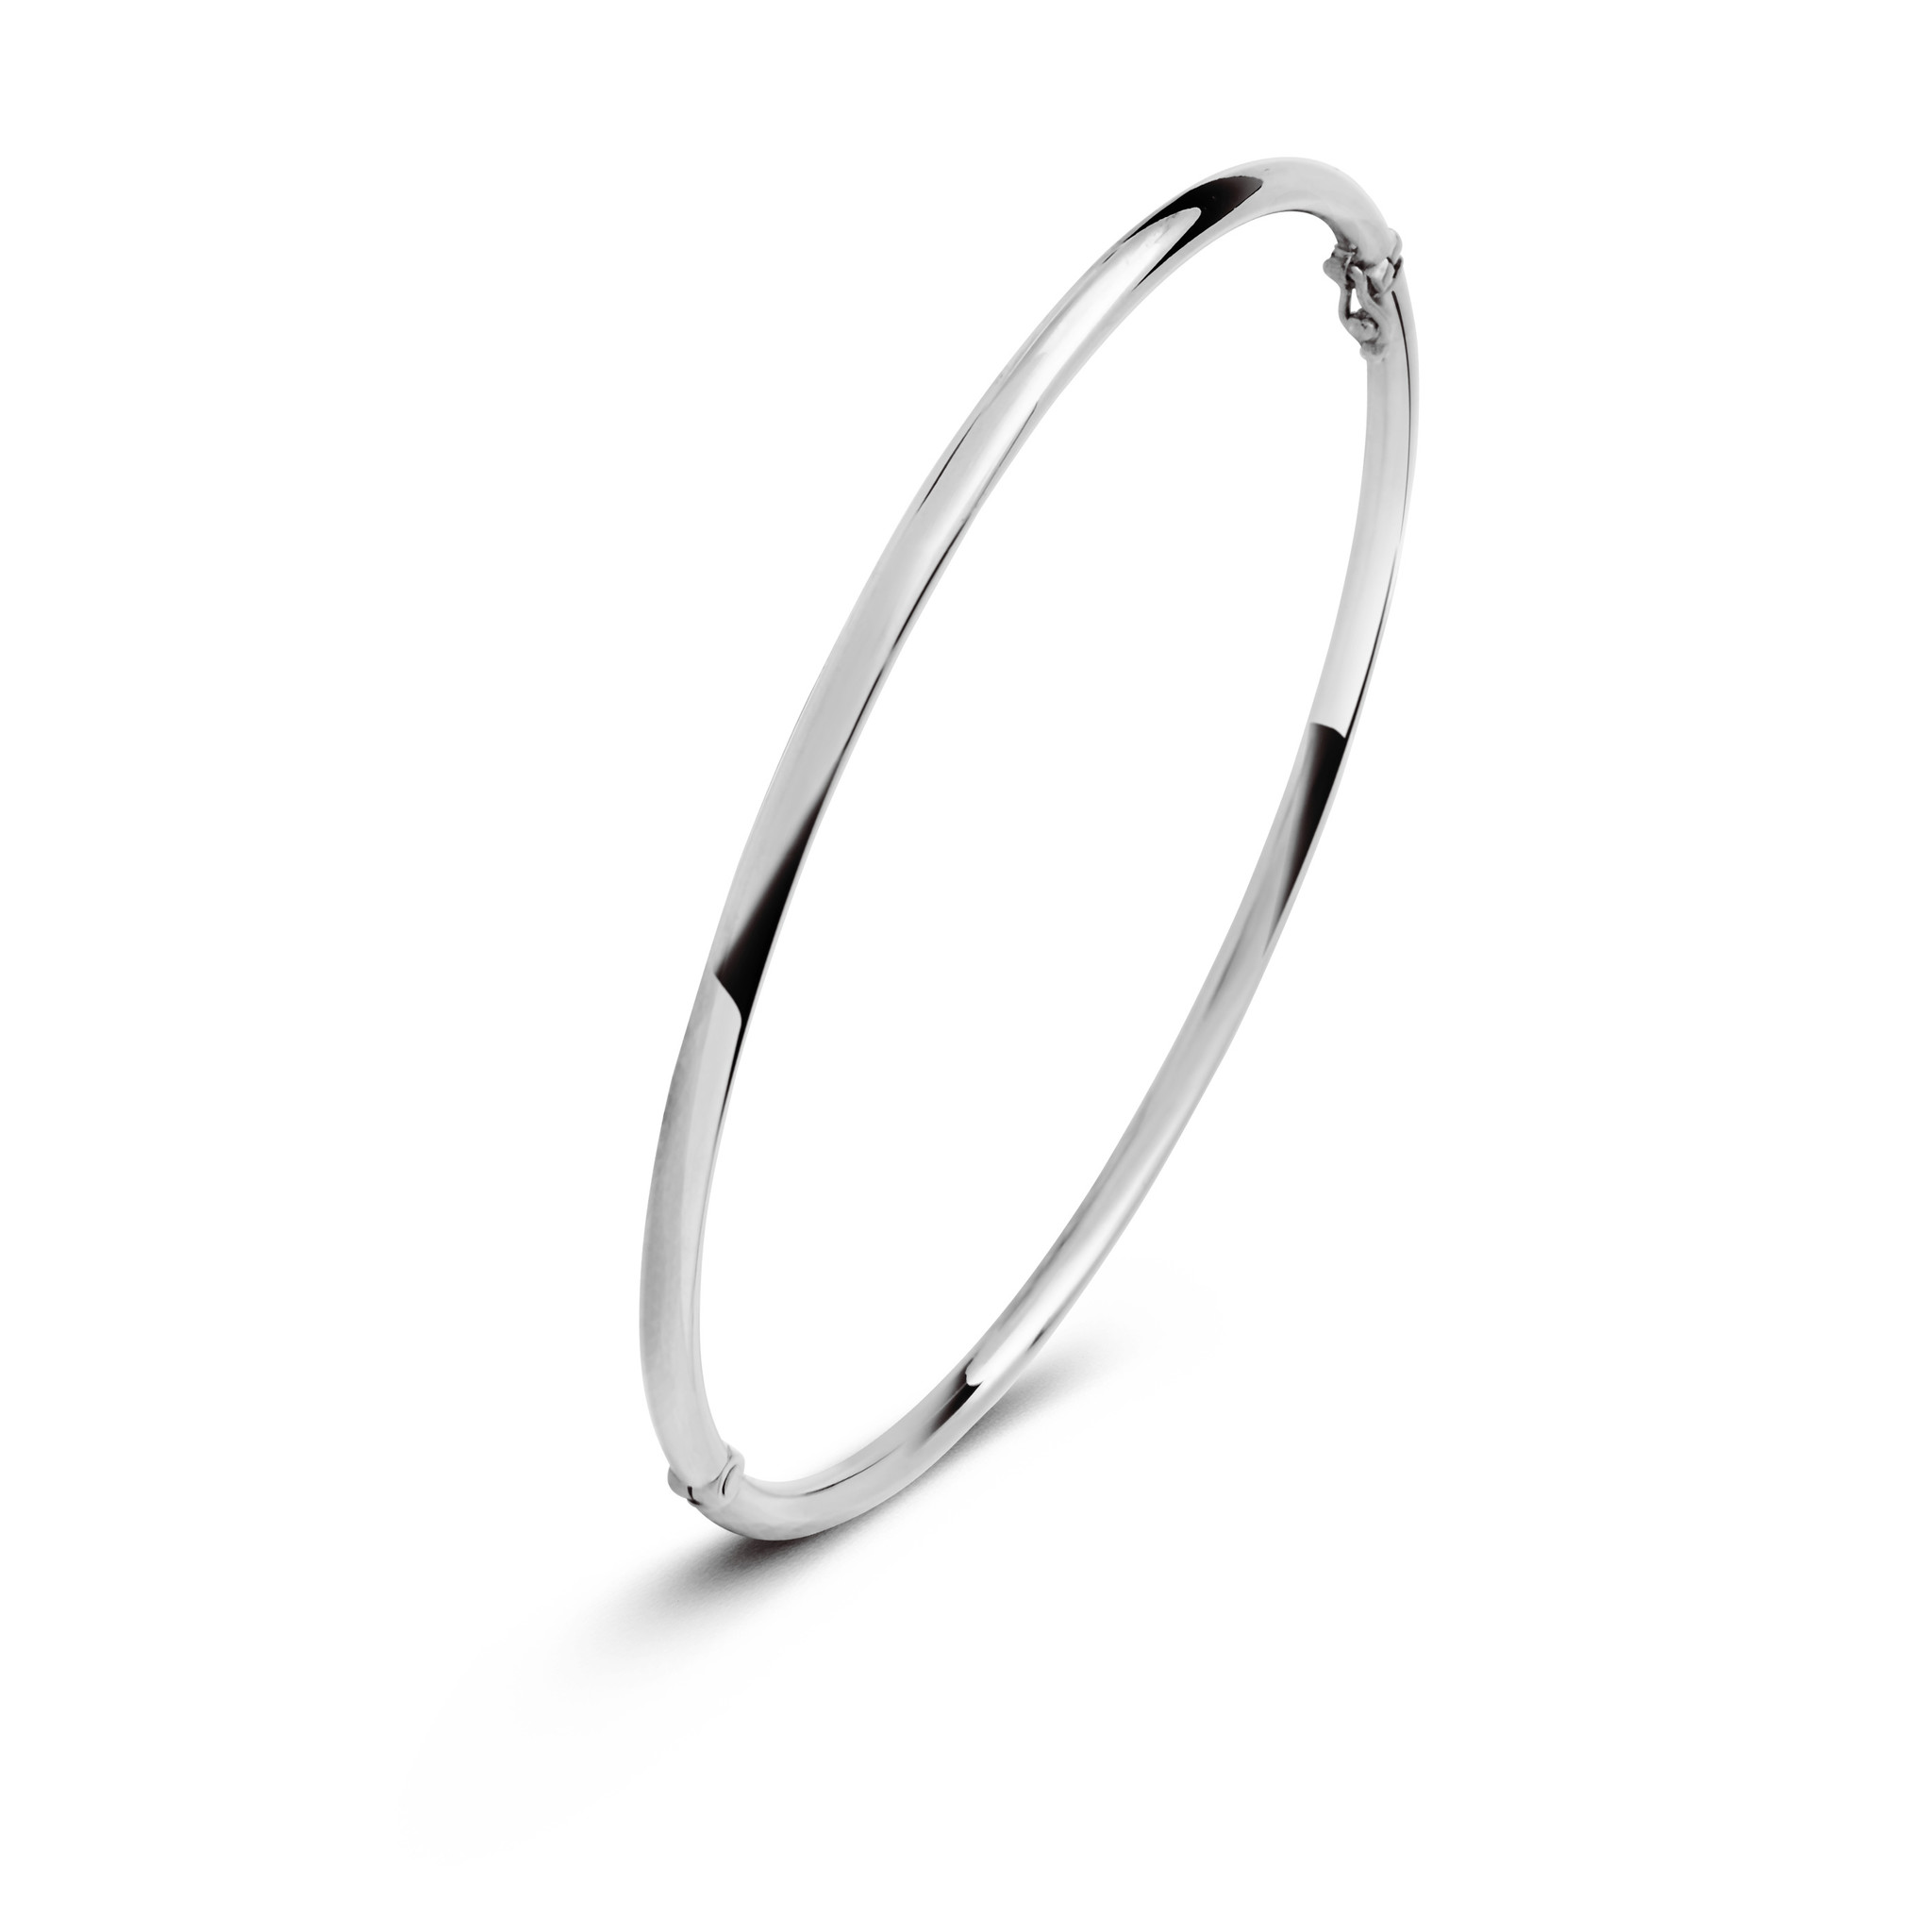 14 karaat witgouden armband - Rond 2 mm - Fjory - Slavenarmband-2